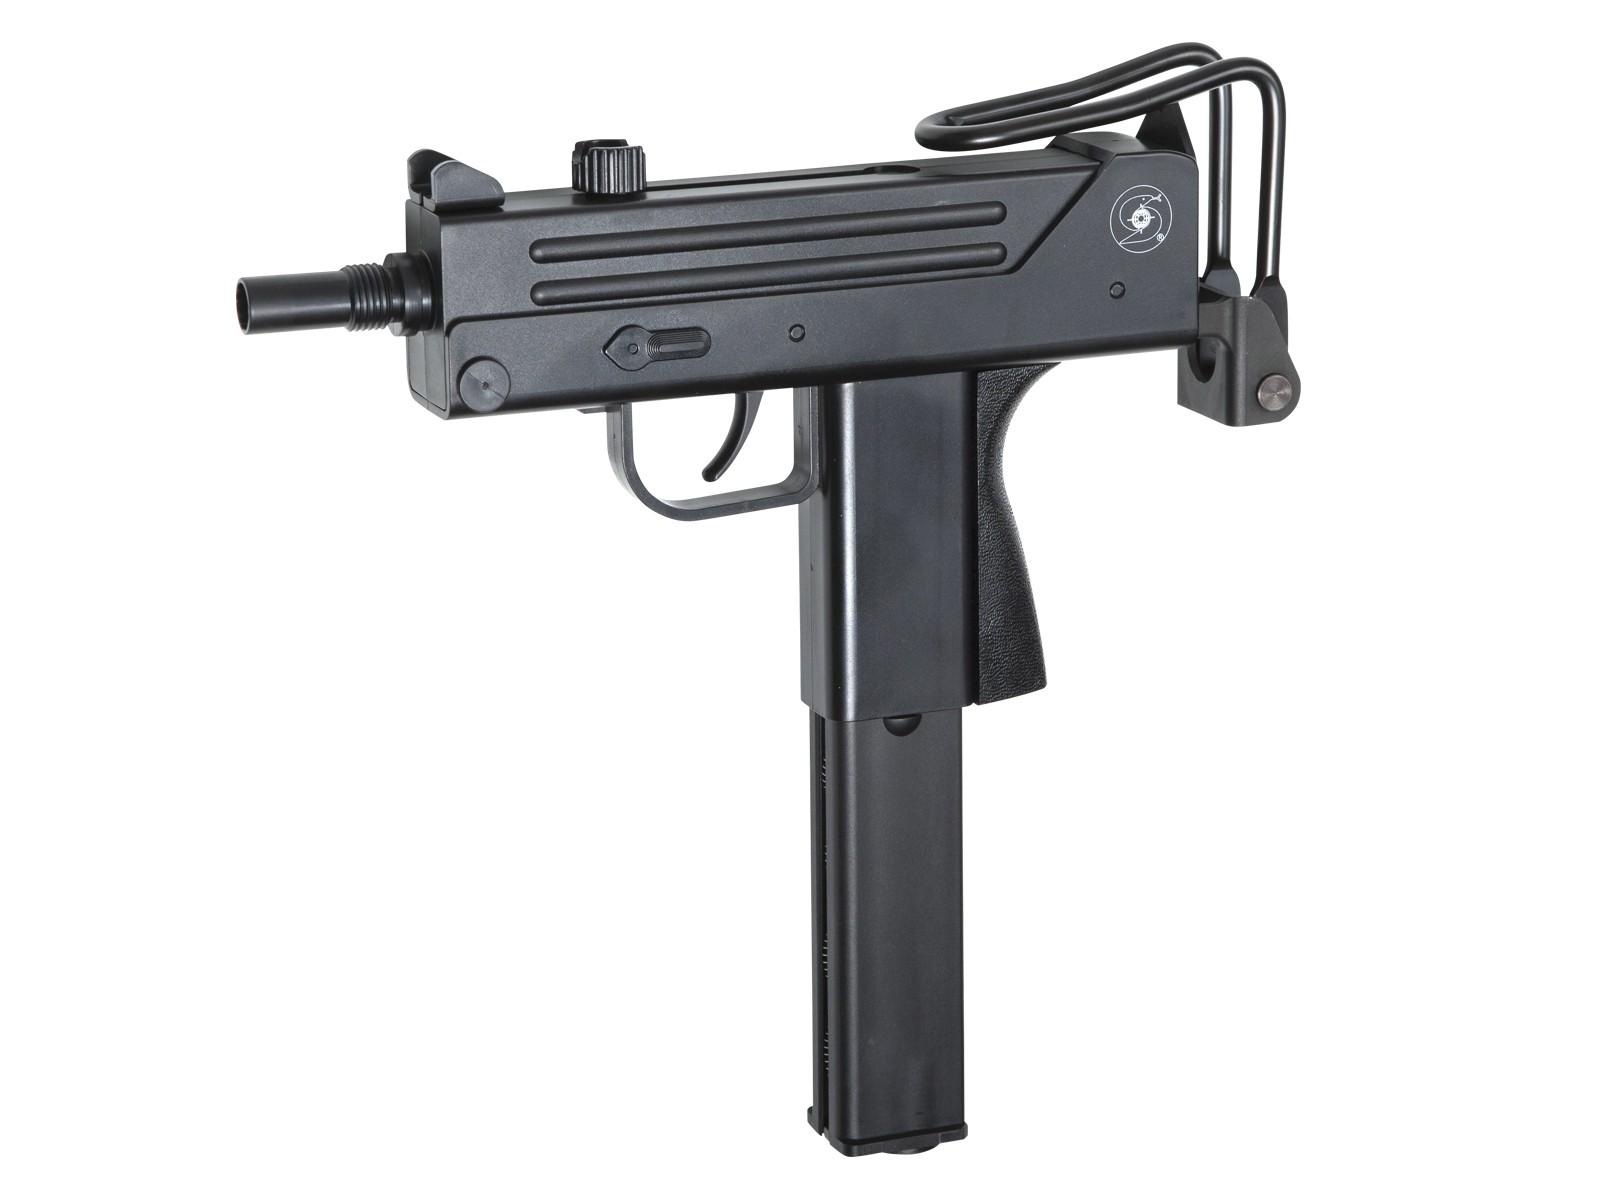 Cheap ASG Cobray Ingram M11 CO2 BB Submachine Gun 0.177